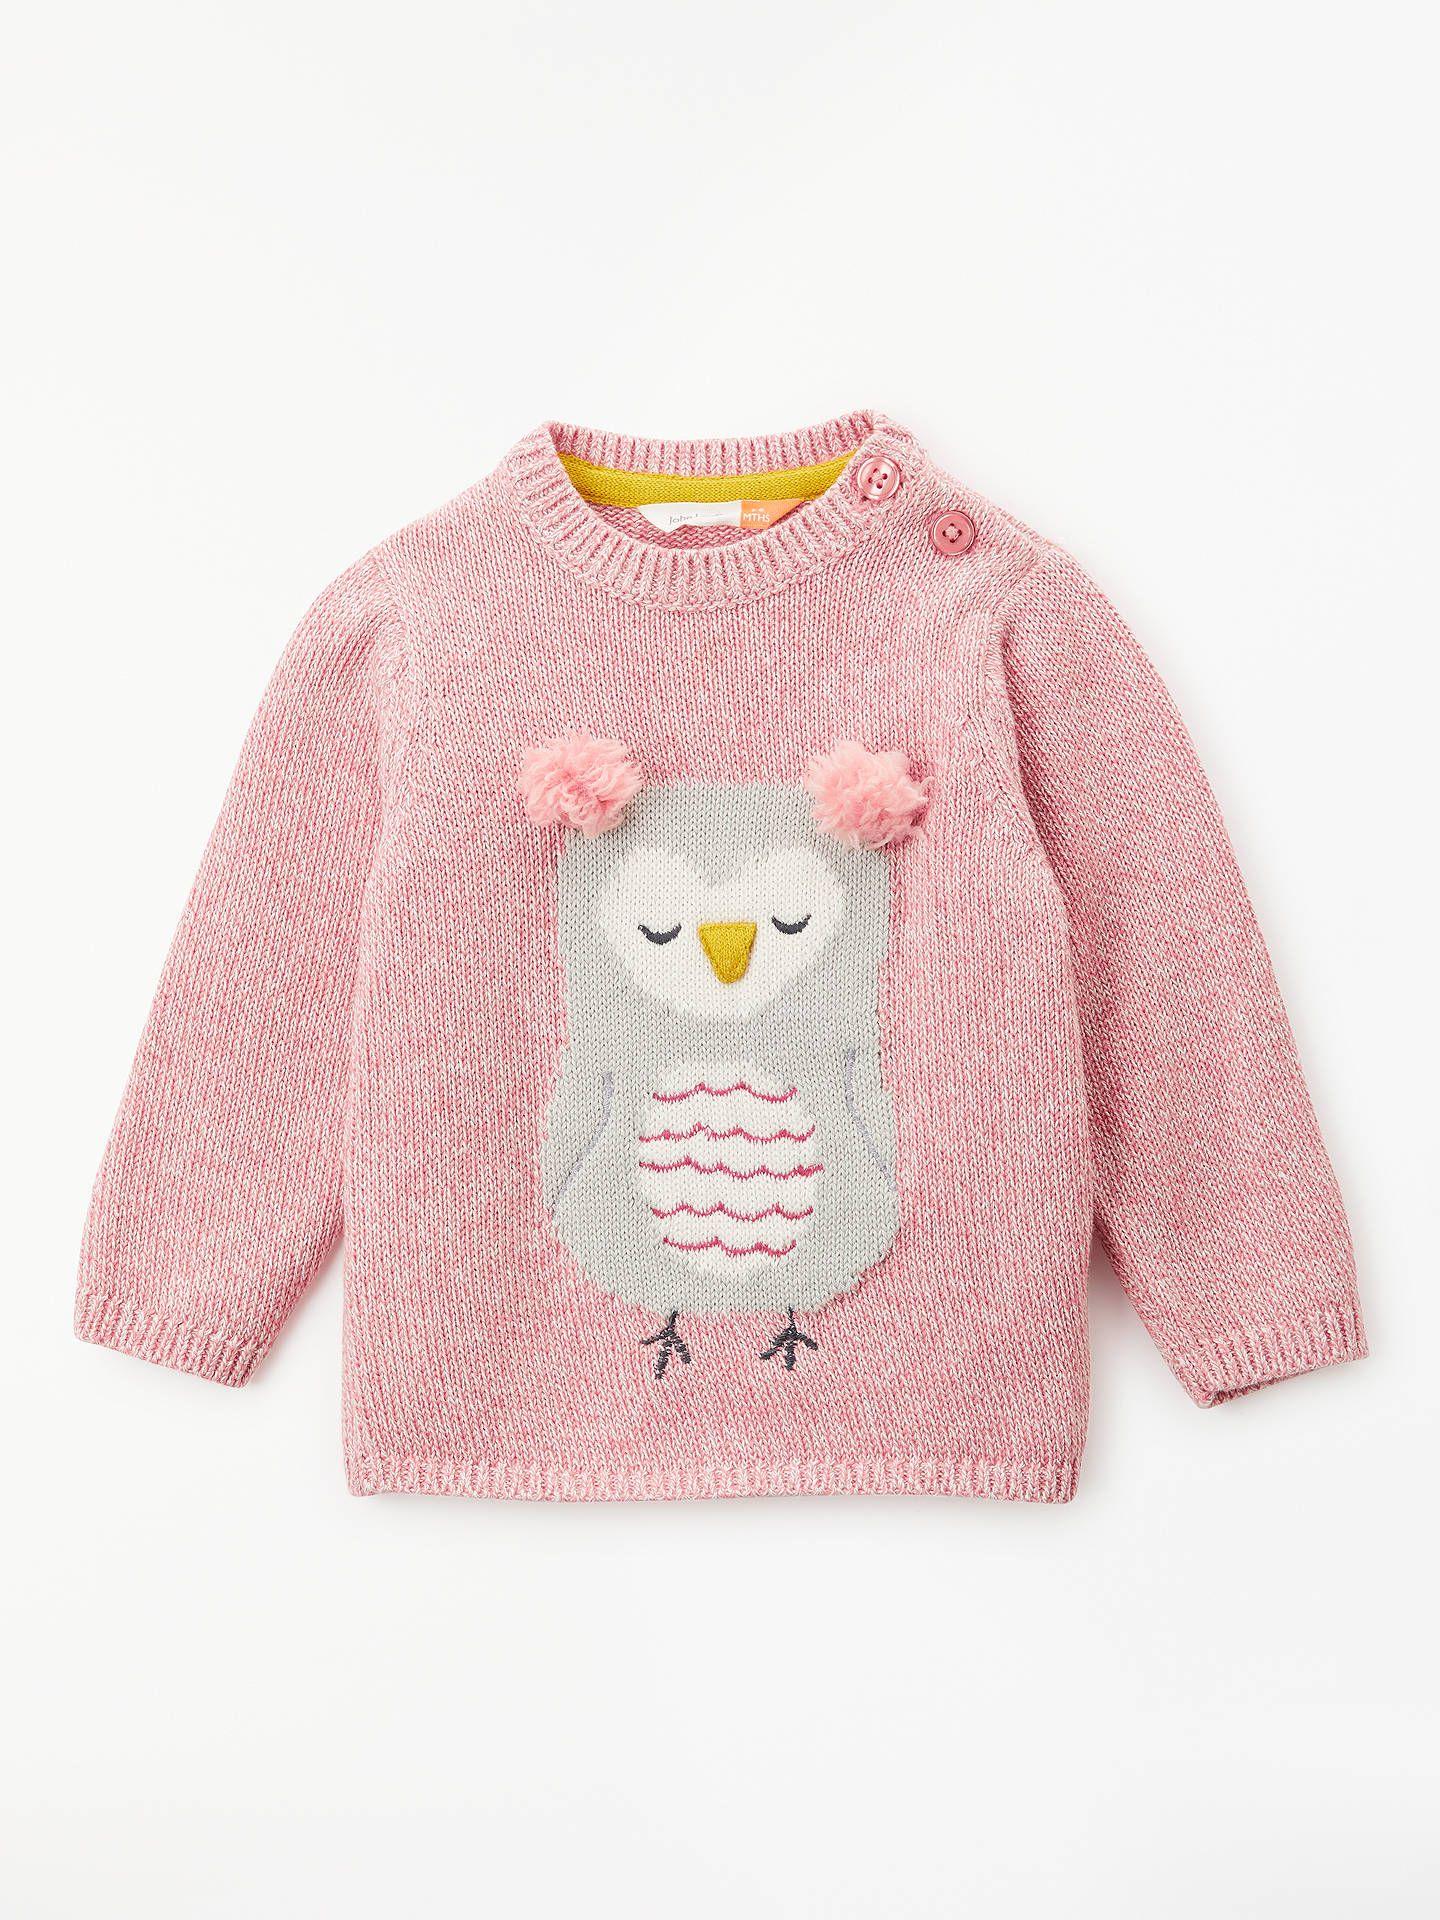 a1a1f7e29 BuyJohn Lewis & Partners Owl Face Jumper, Pink, 0-3 months Online